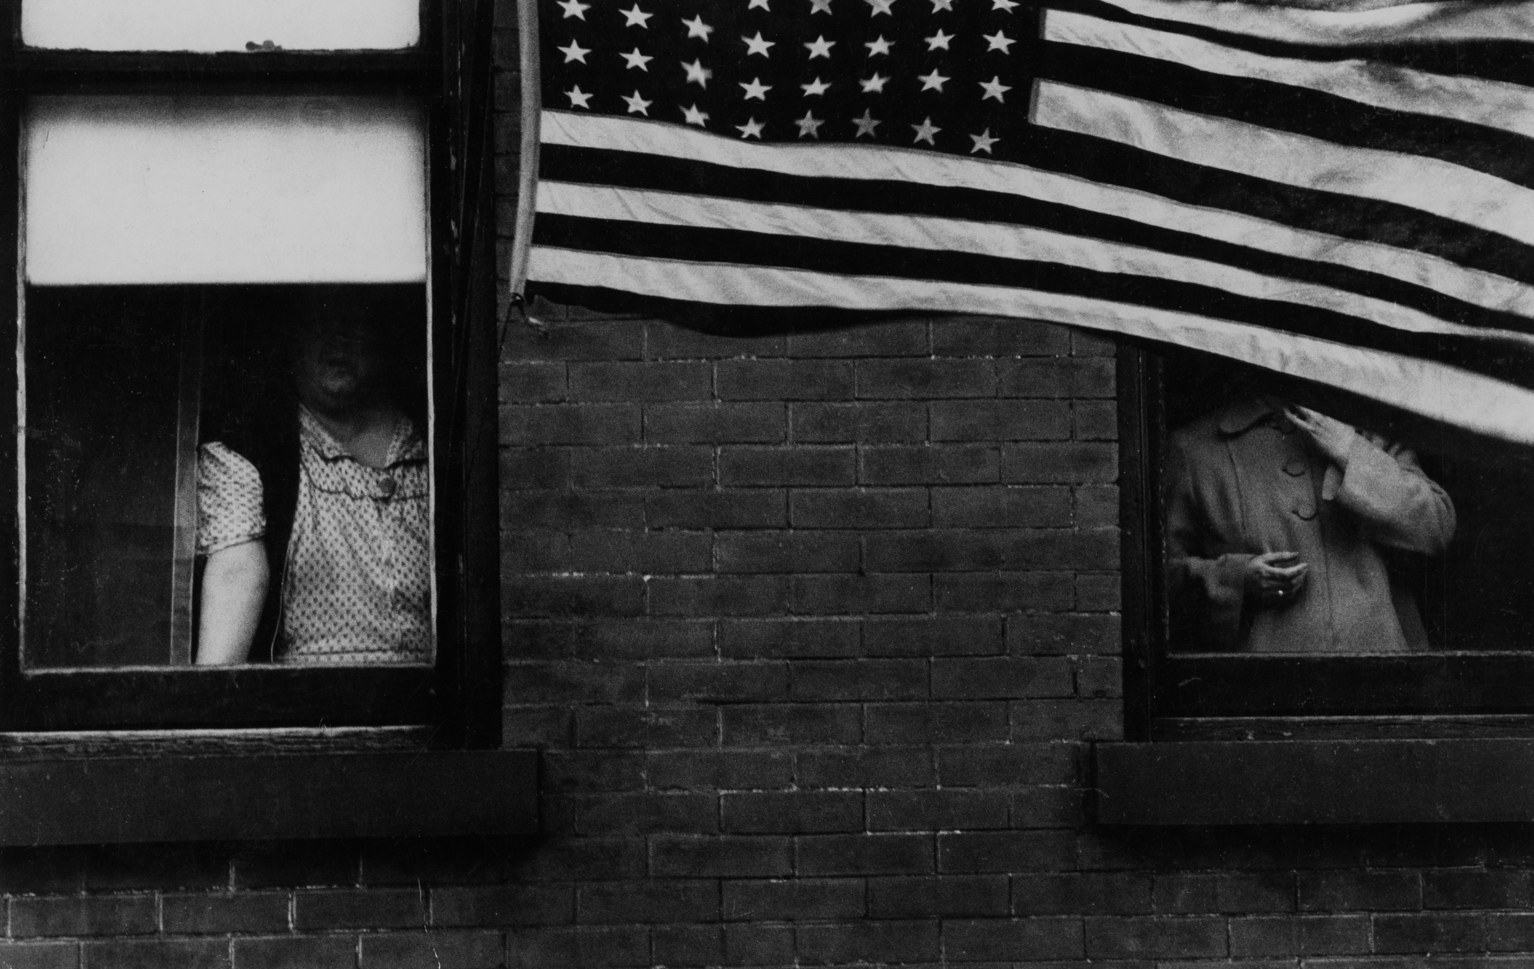 Robert Frank, Parade—Hoboken, New Jersey, (1955)